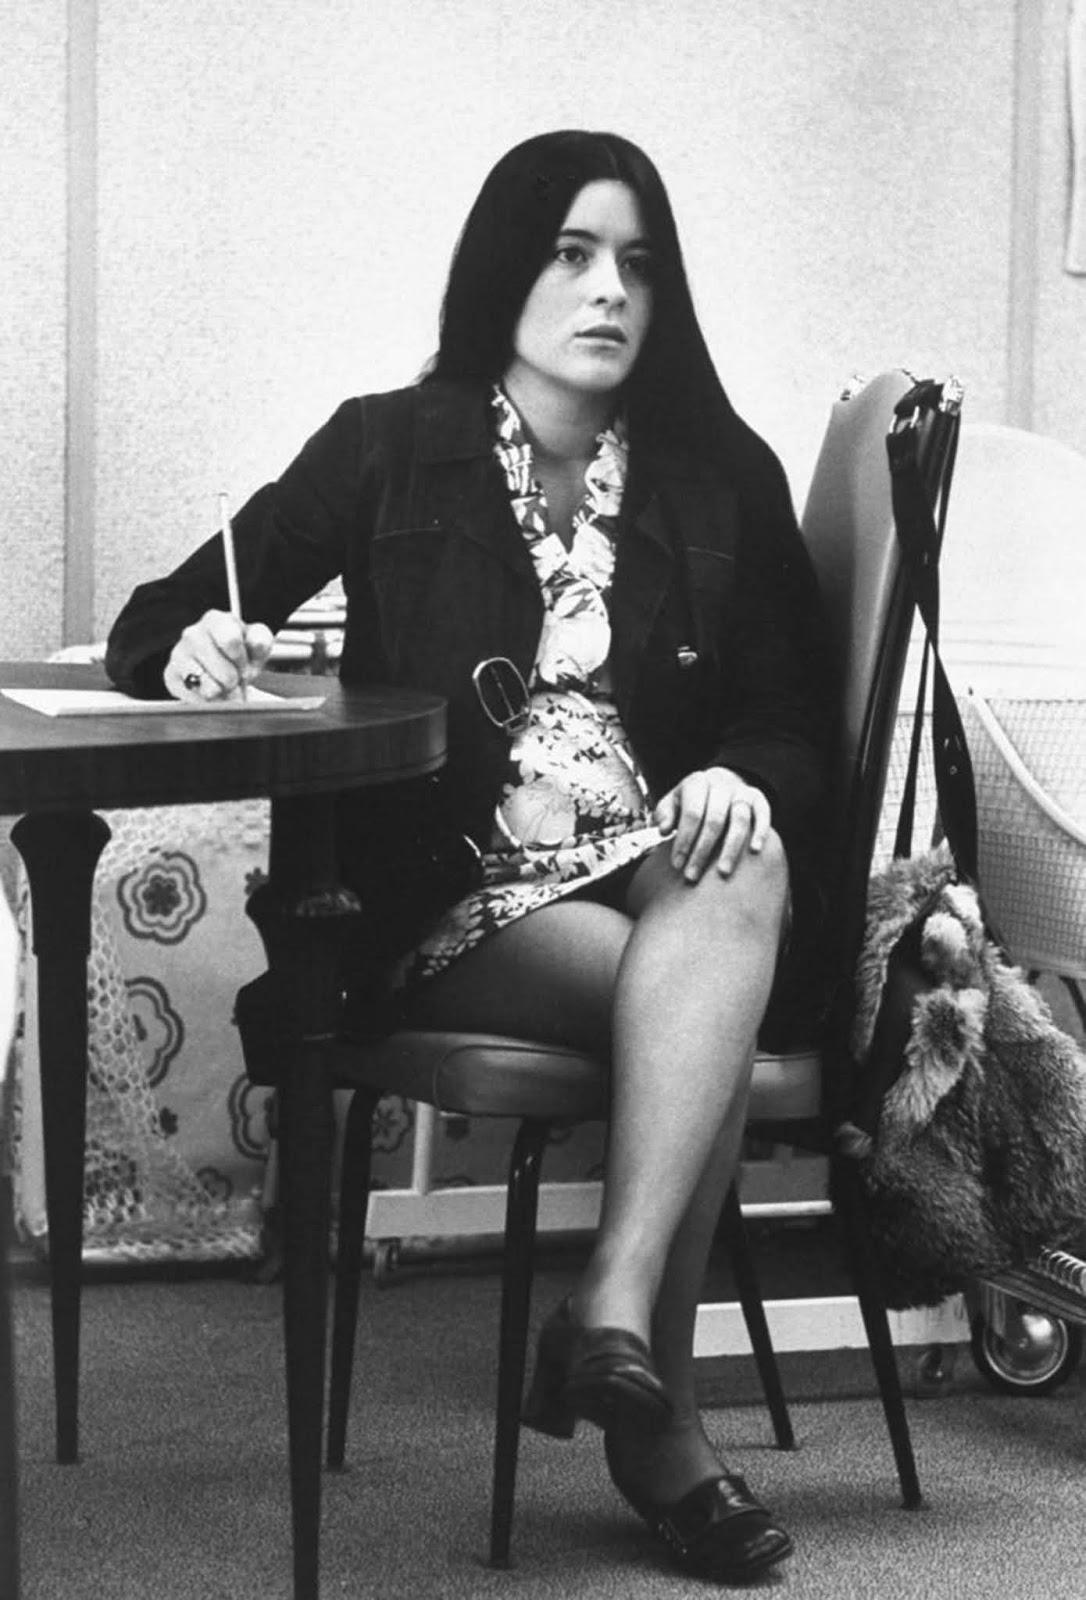 teen_pregnancy_1970s (3).jpg